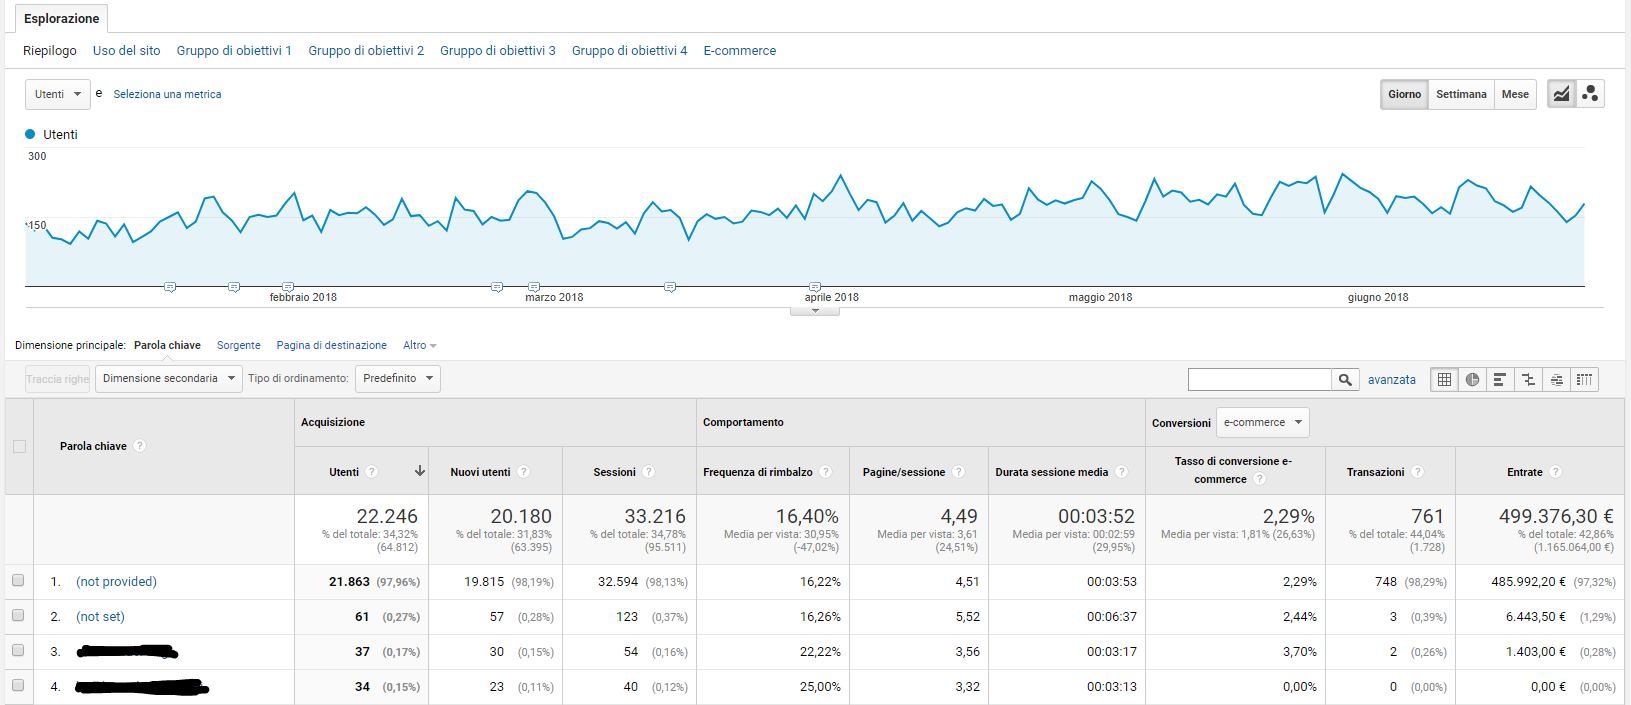 Traffico organico - Rapporto Google Analytics